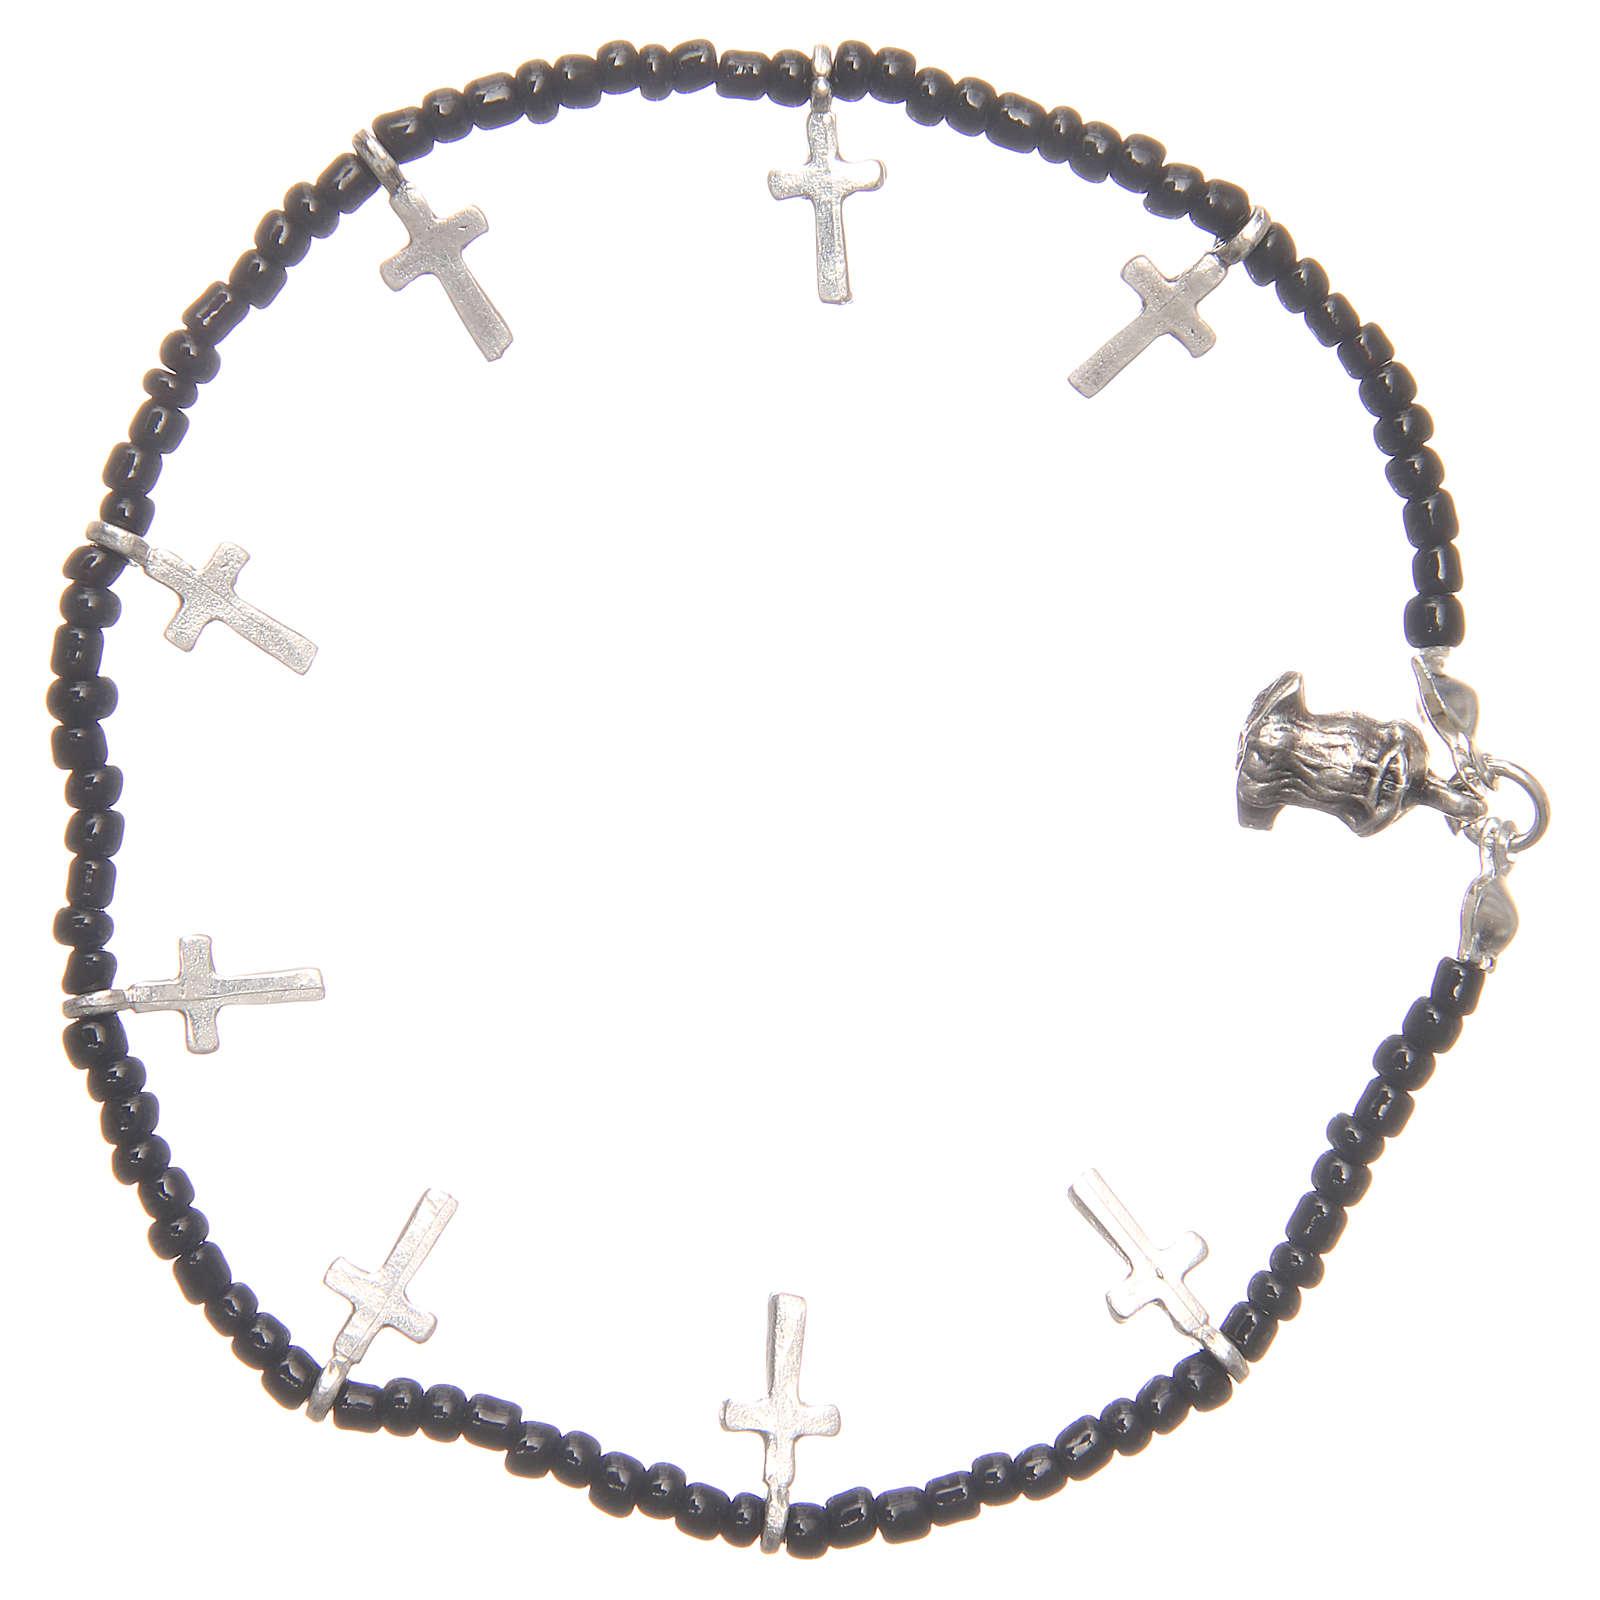 Bracciale croci perline nere 4